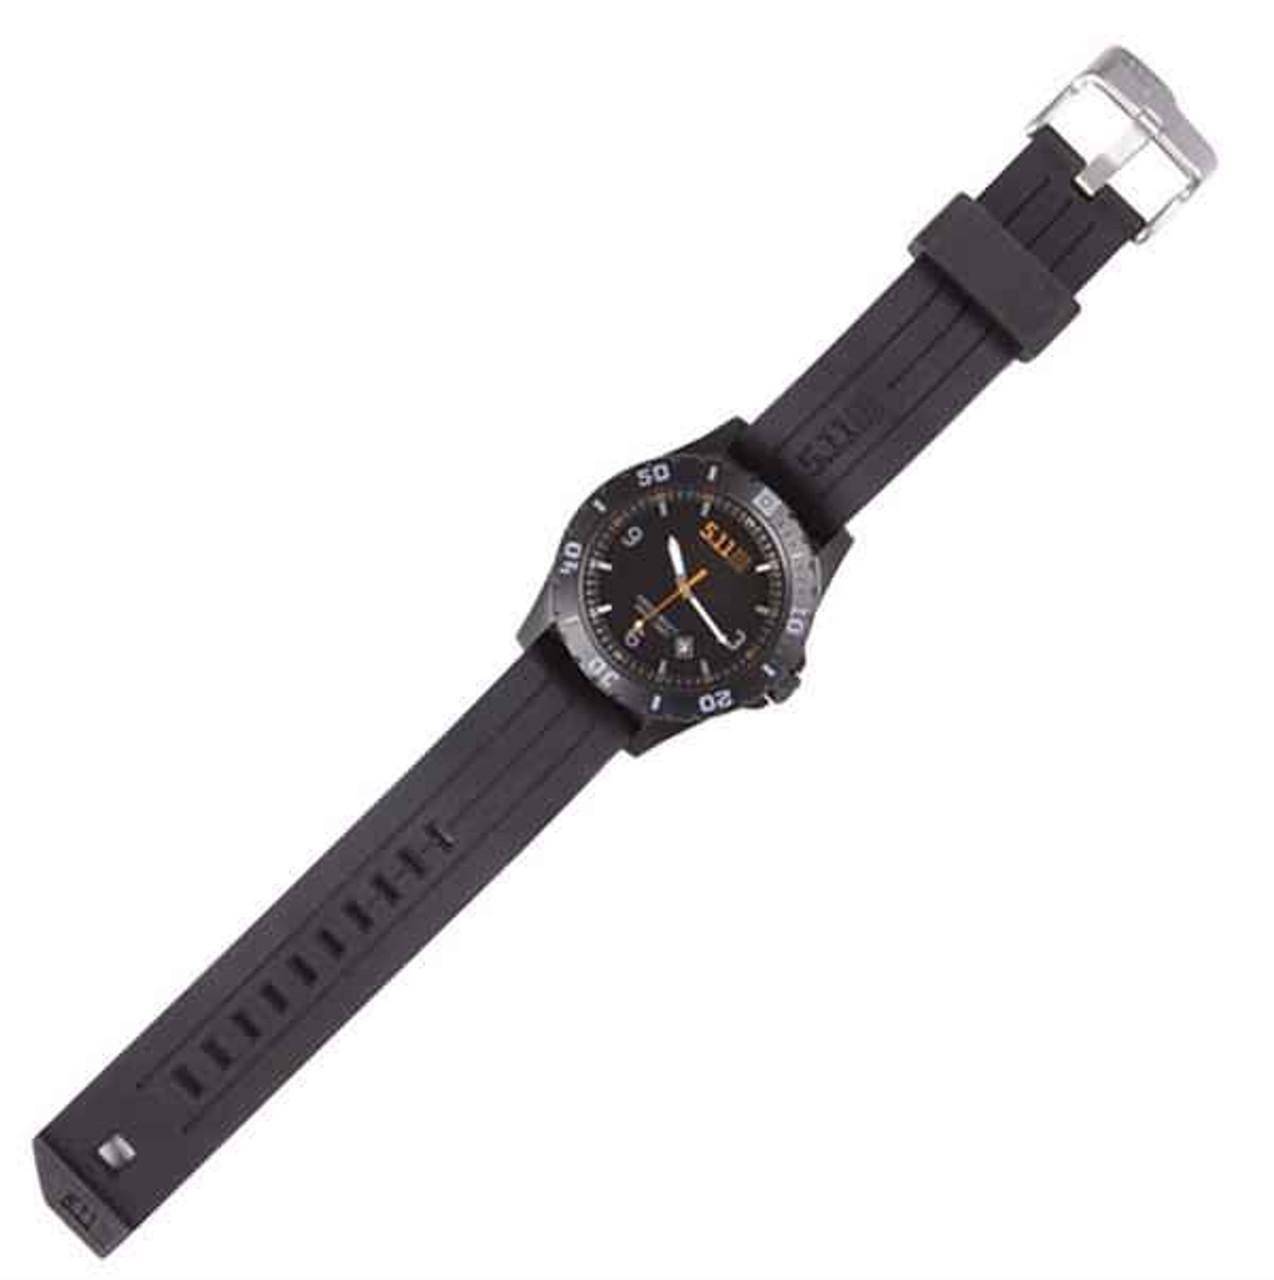 5.11 Tactical Sentinel Watch, Black, Waterproof